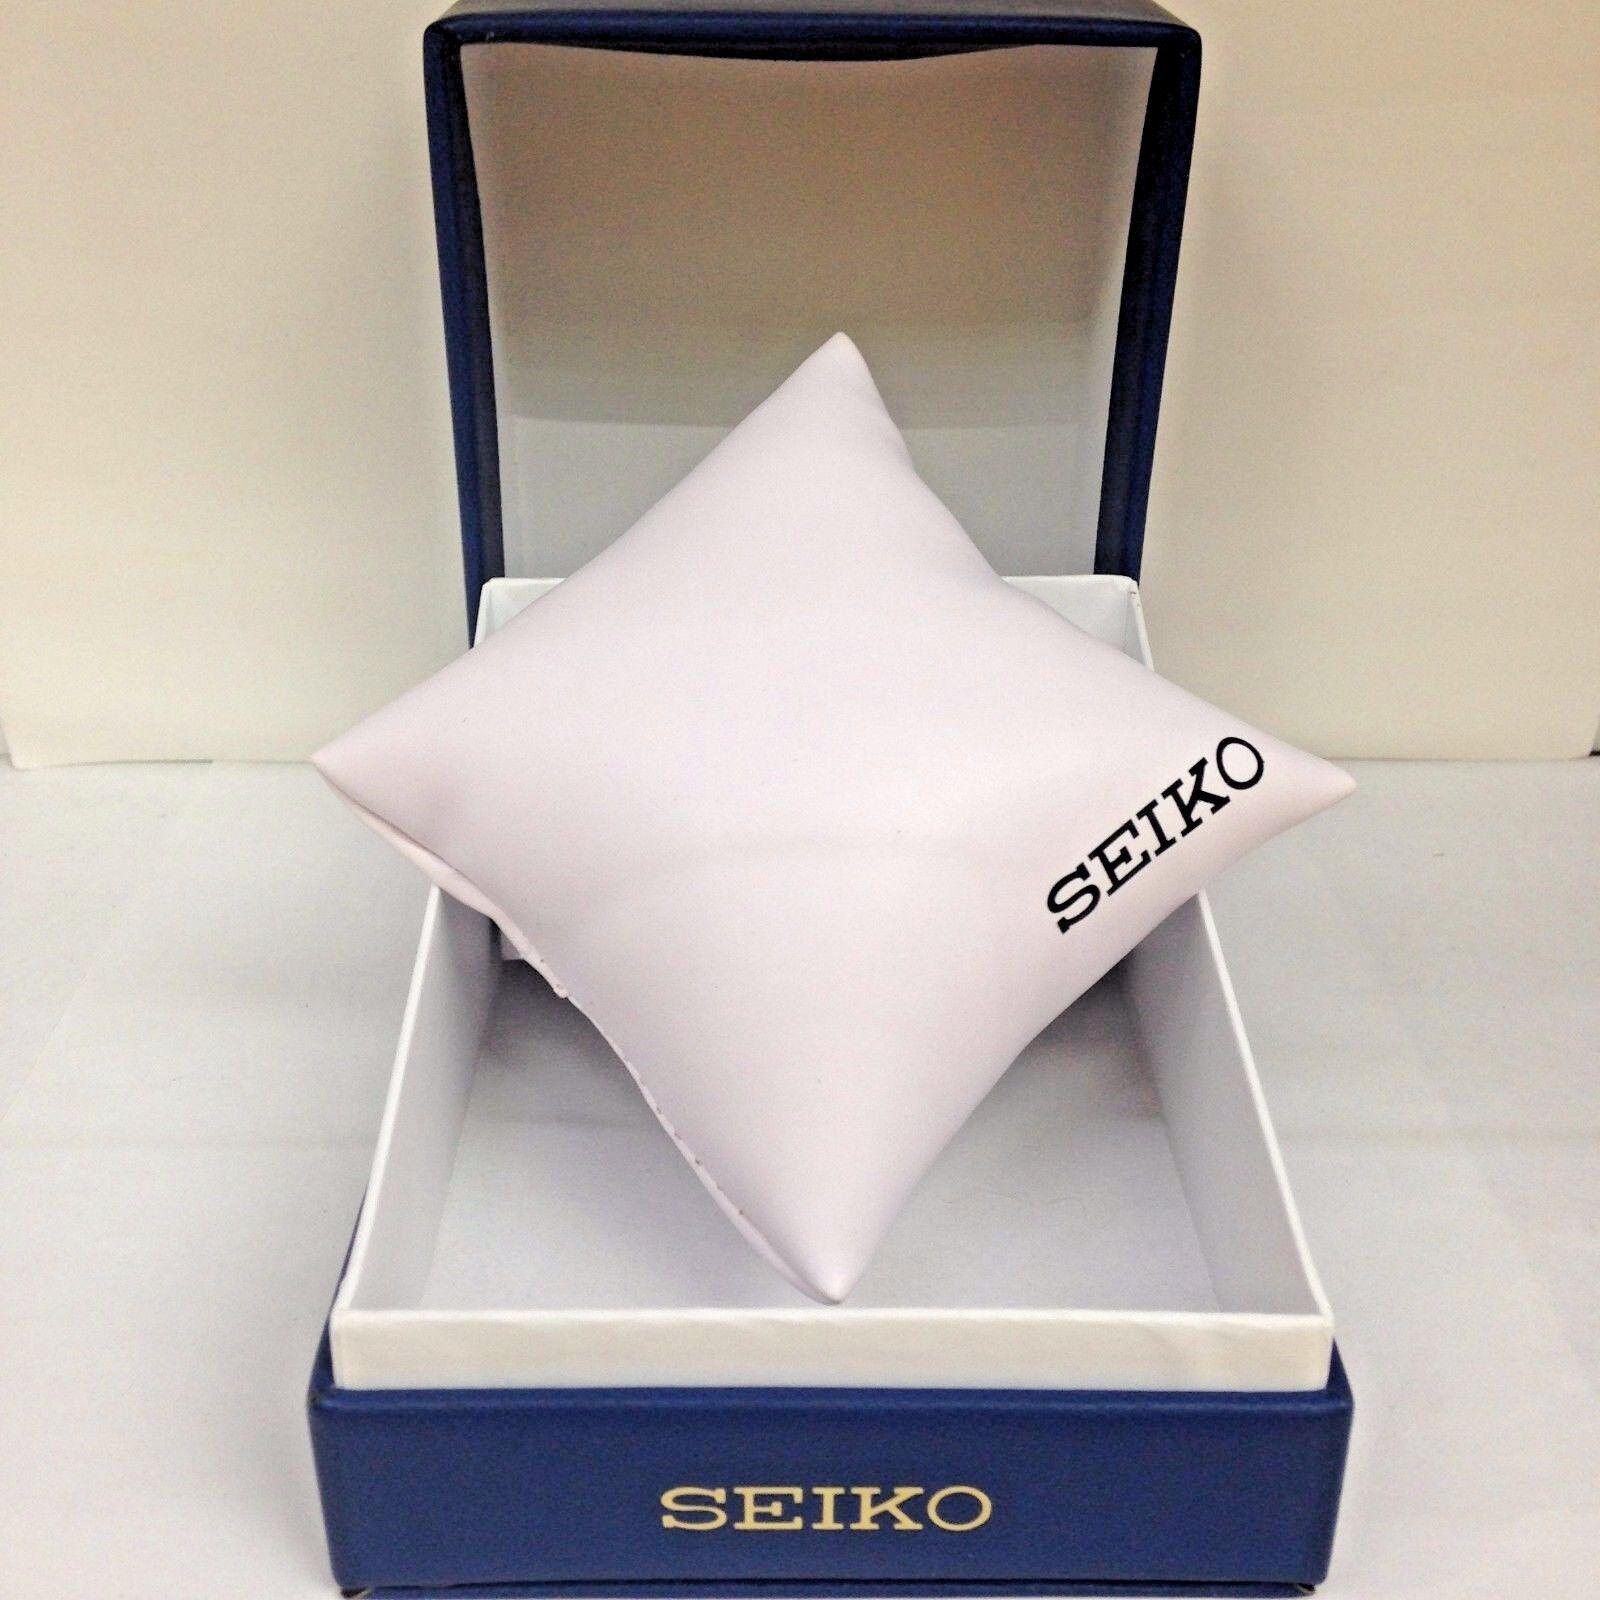 New SEIKO Blue PU Watch Box Presentation Storage Case with m